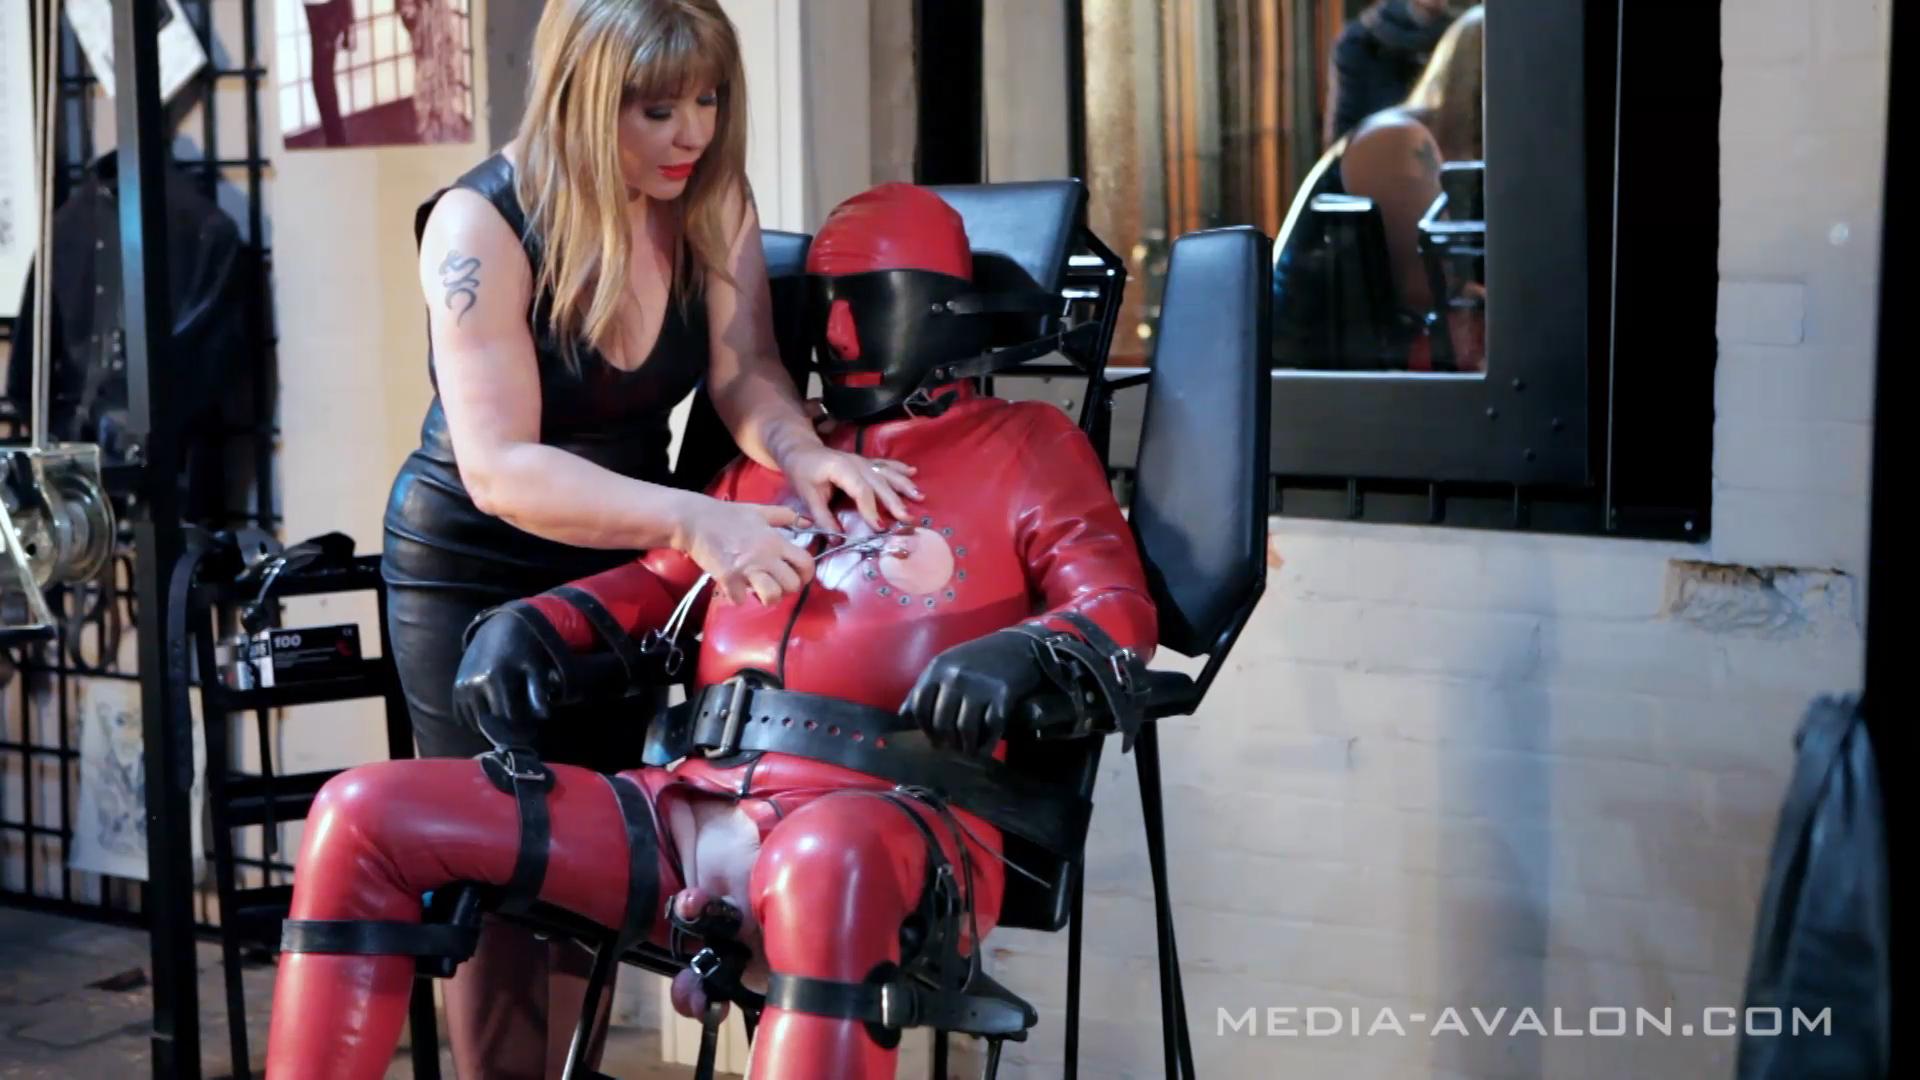 Leather domina nipple torture leather bondage 4